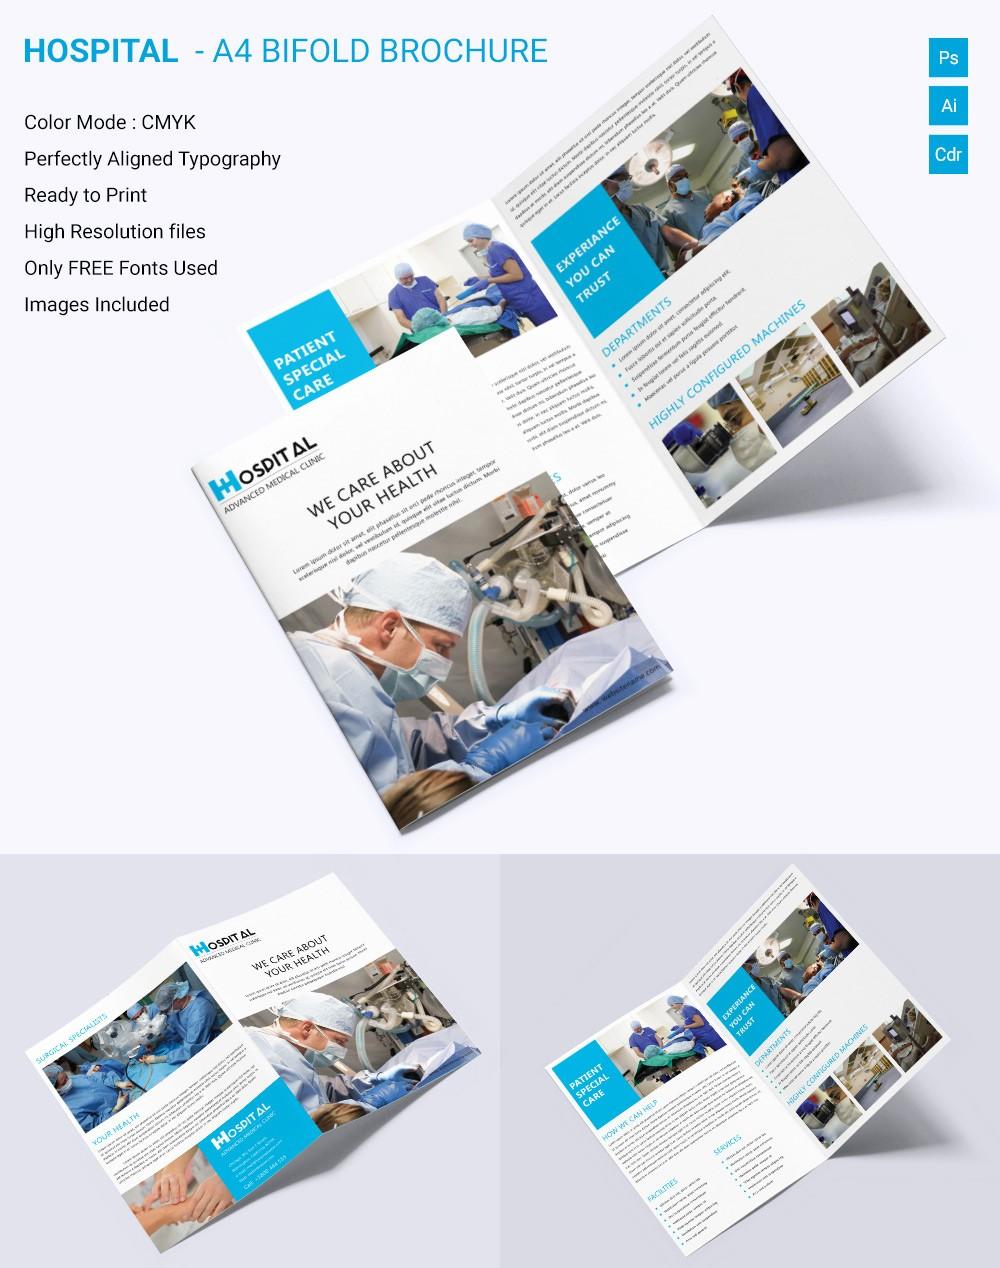 Bi Fold Brochure Templates Free Fresh Medical Brochure Template – 39 Free Psd Ai Vector Eps